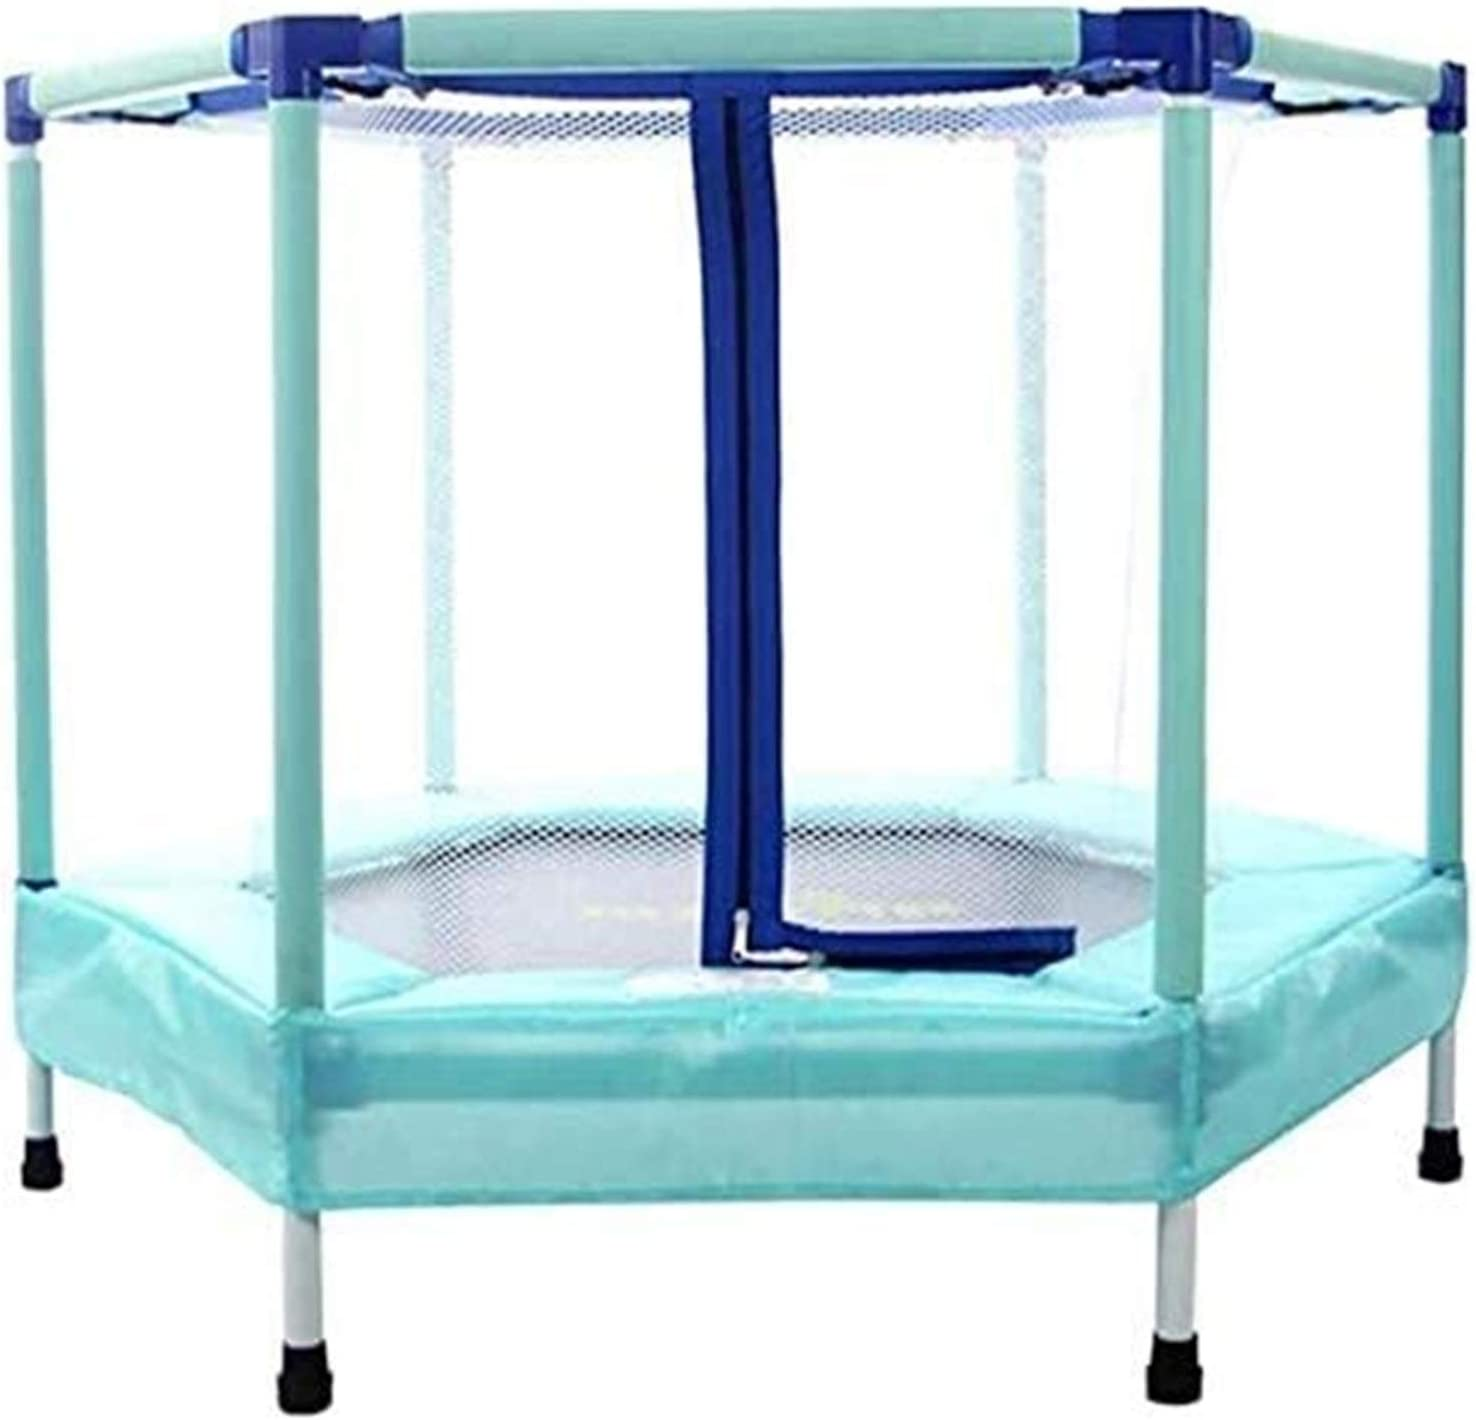 LXYLXY Child Superlatite Protection Net Trampoline Kids Indoor Tram Fitness Max 90% OFF